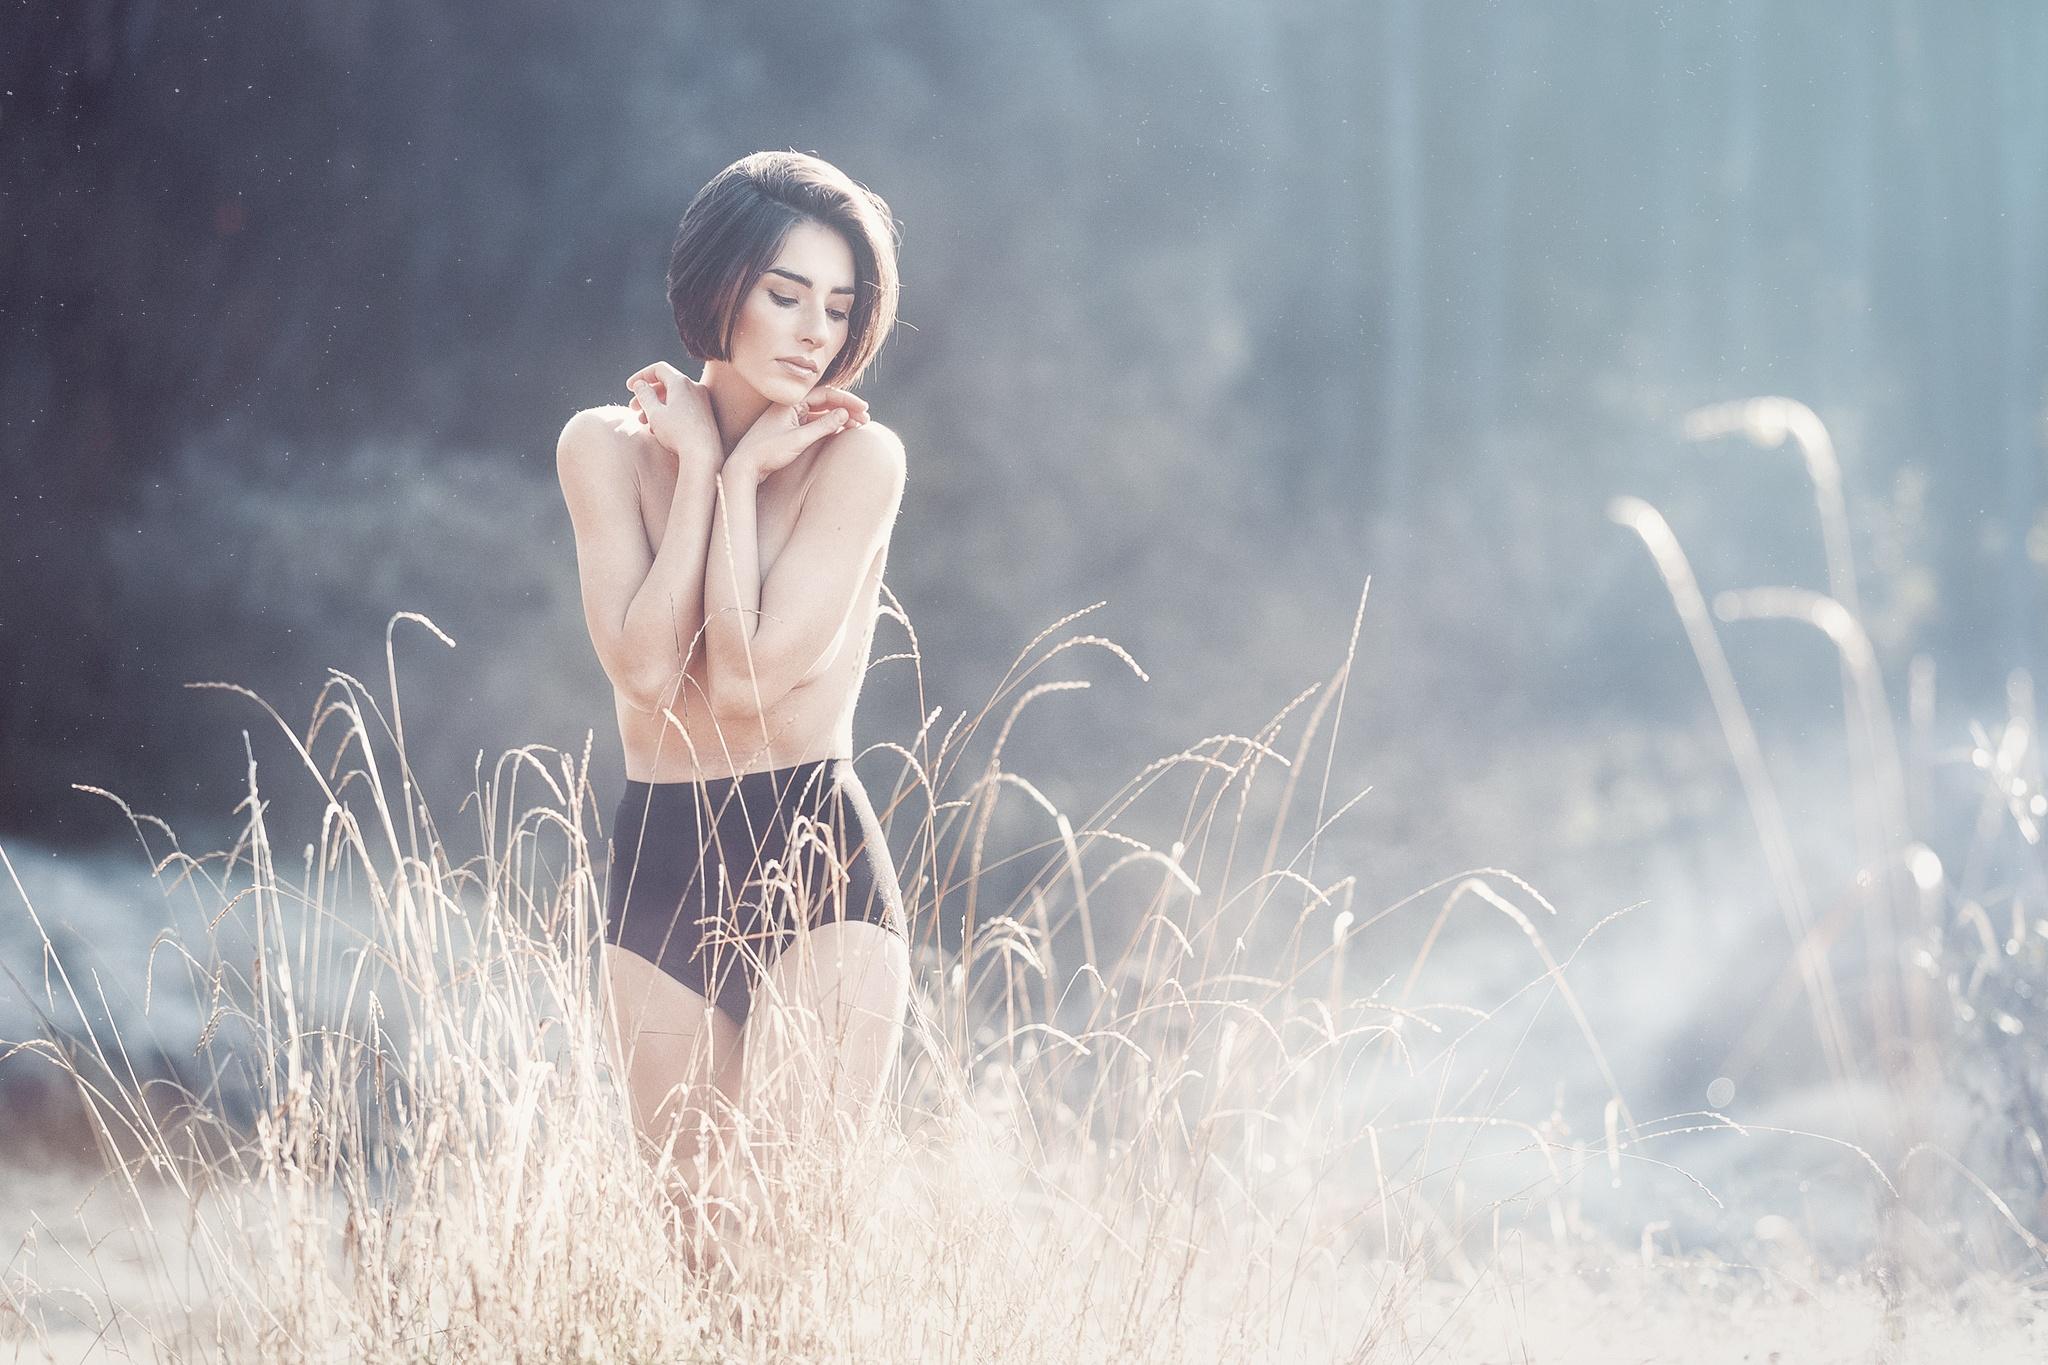 glooms beside by Oujasenne Muhlen